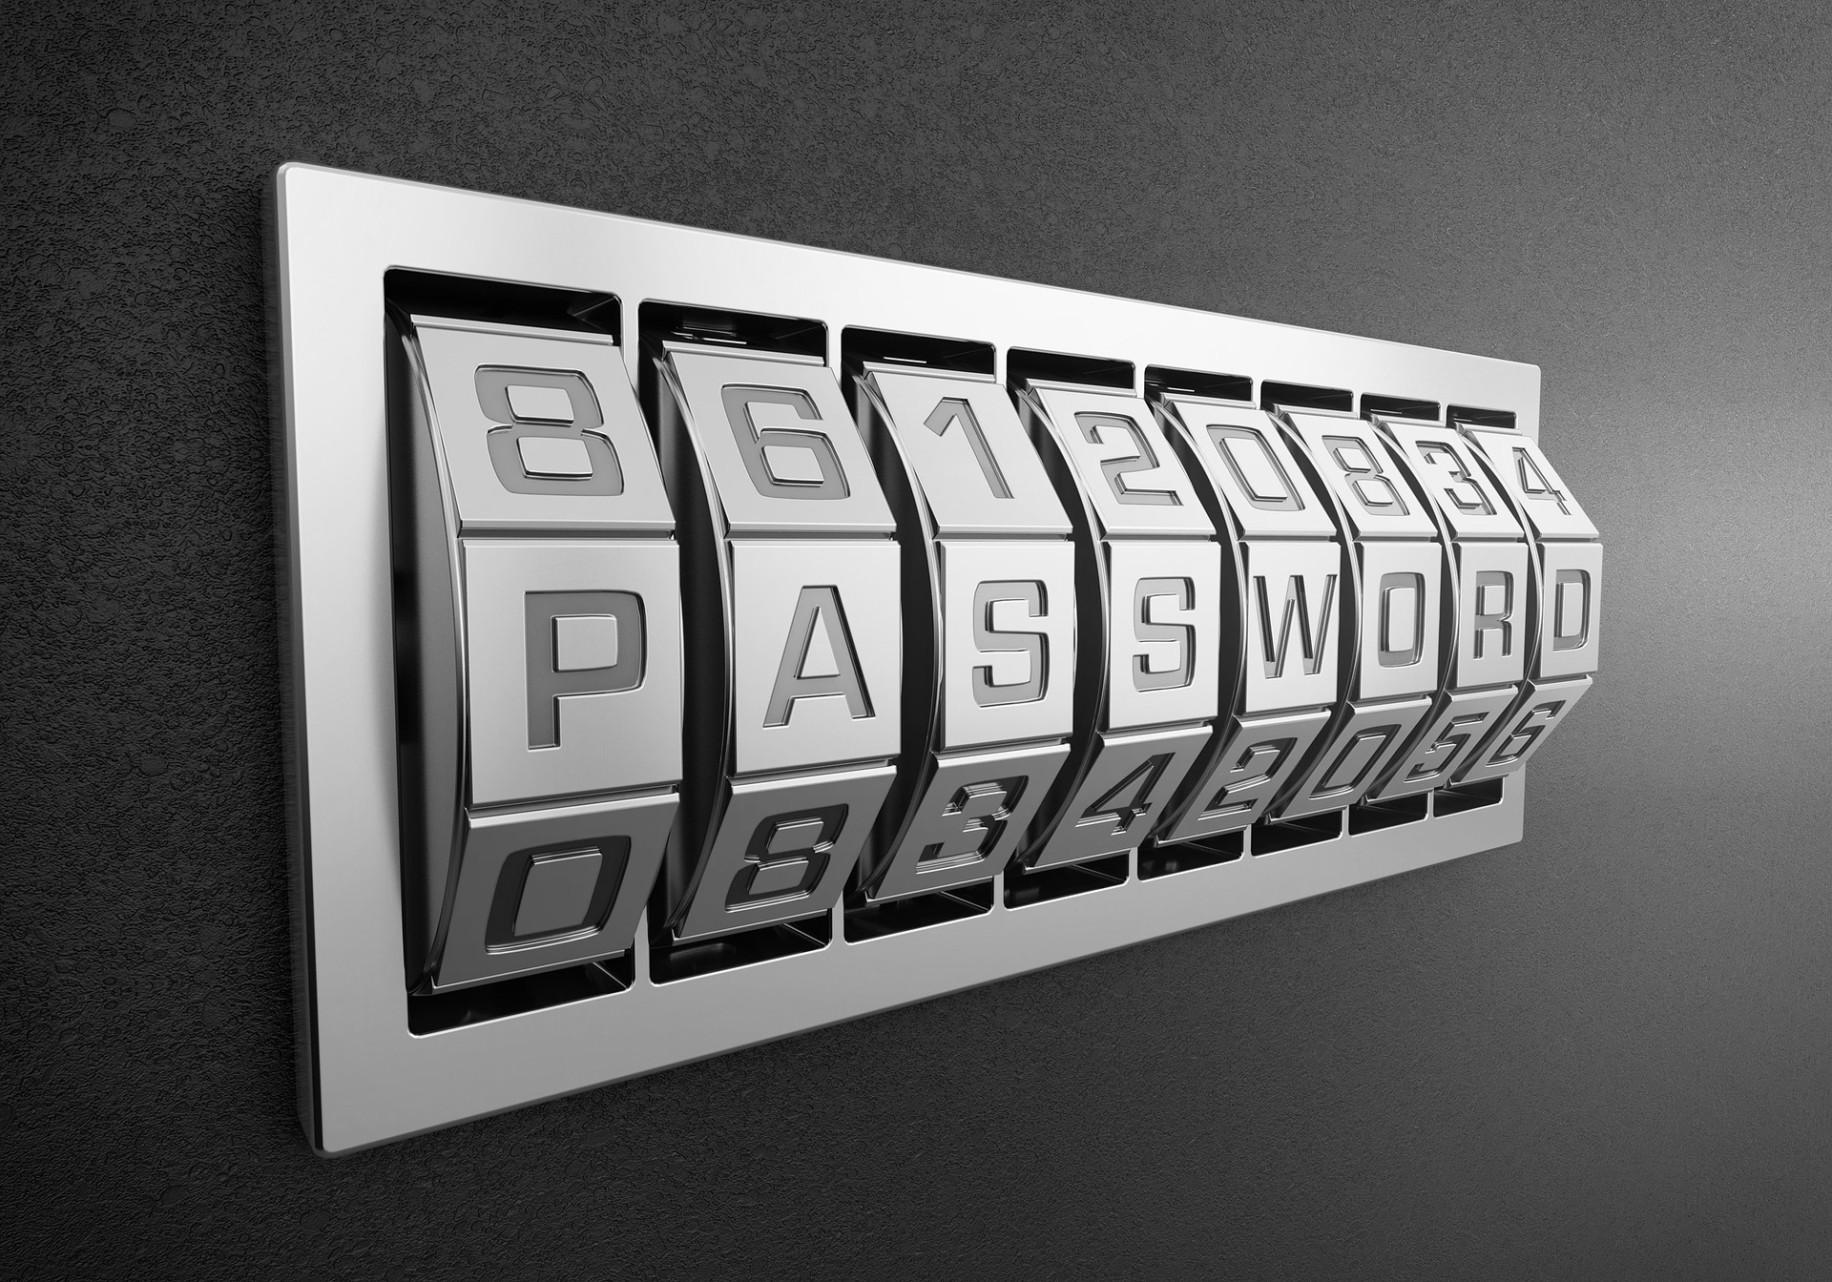 Wallpaper Desktop 1366x768 Car 5 Steps To Create Secure Passwords